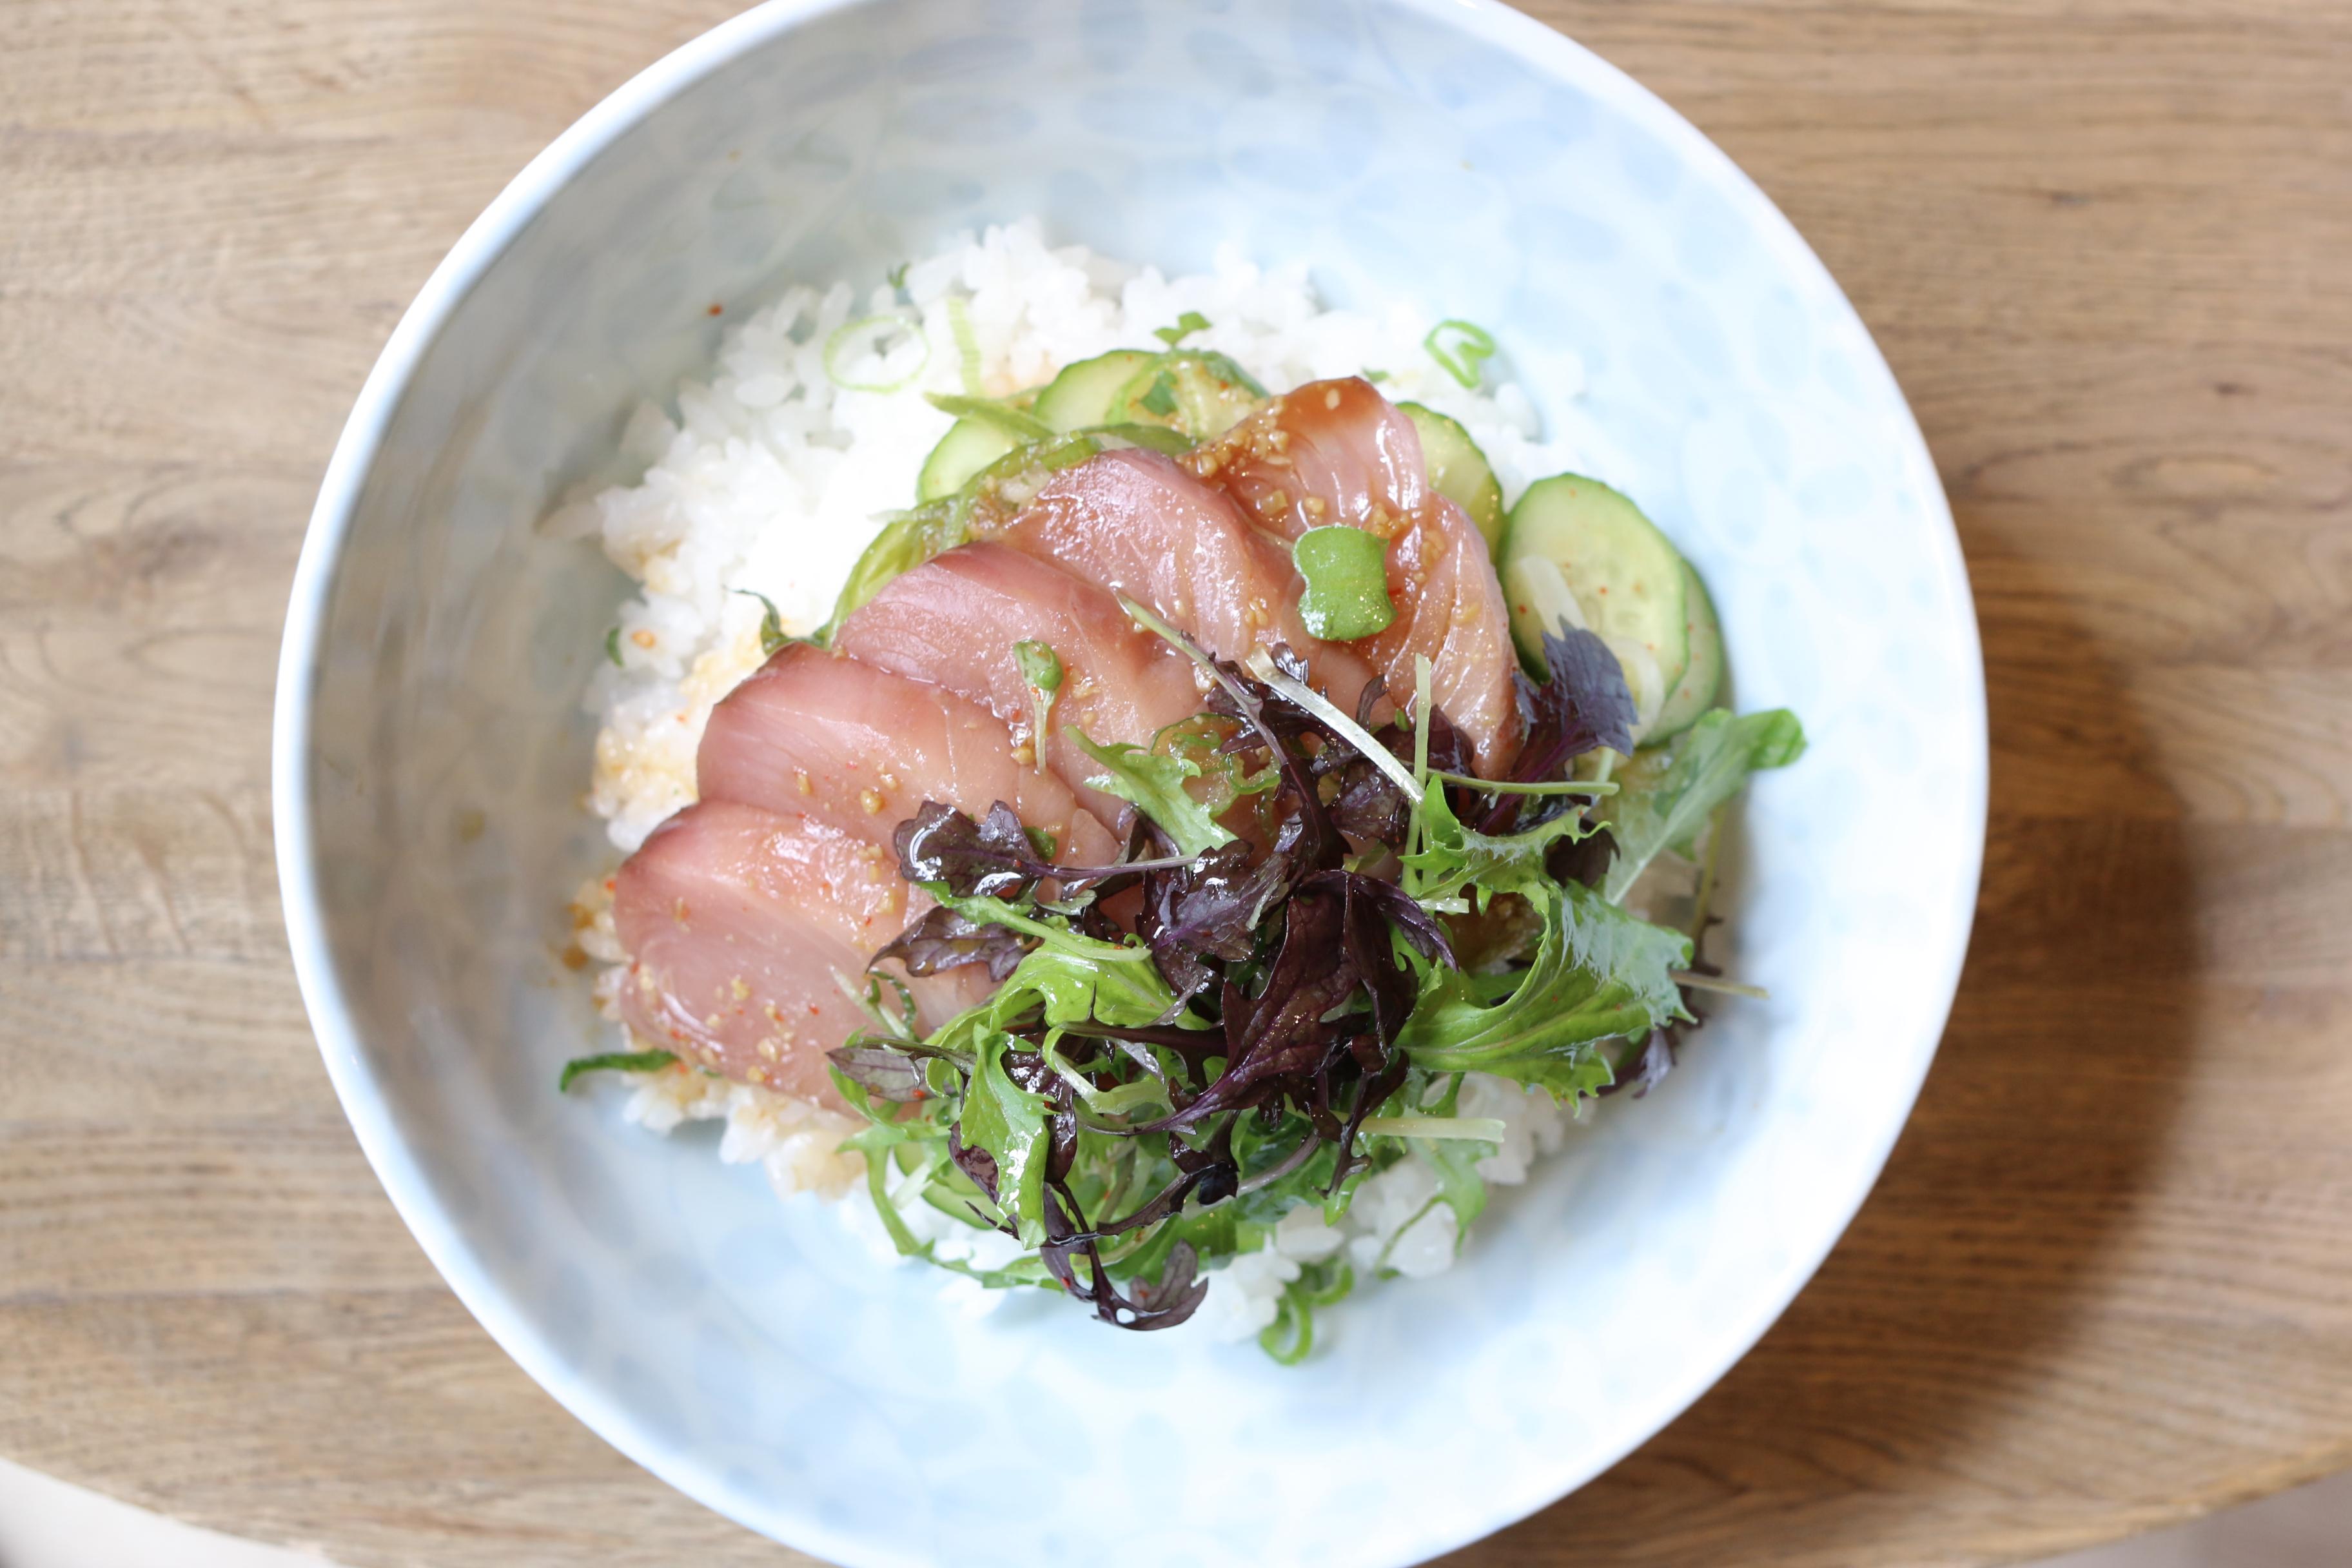 Recipes: How to Make & Flavor Poke Rice, Chikarashi-Style